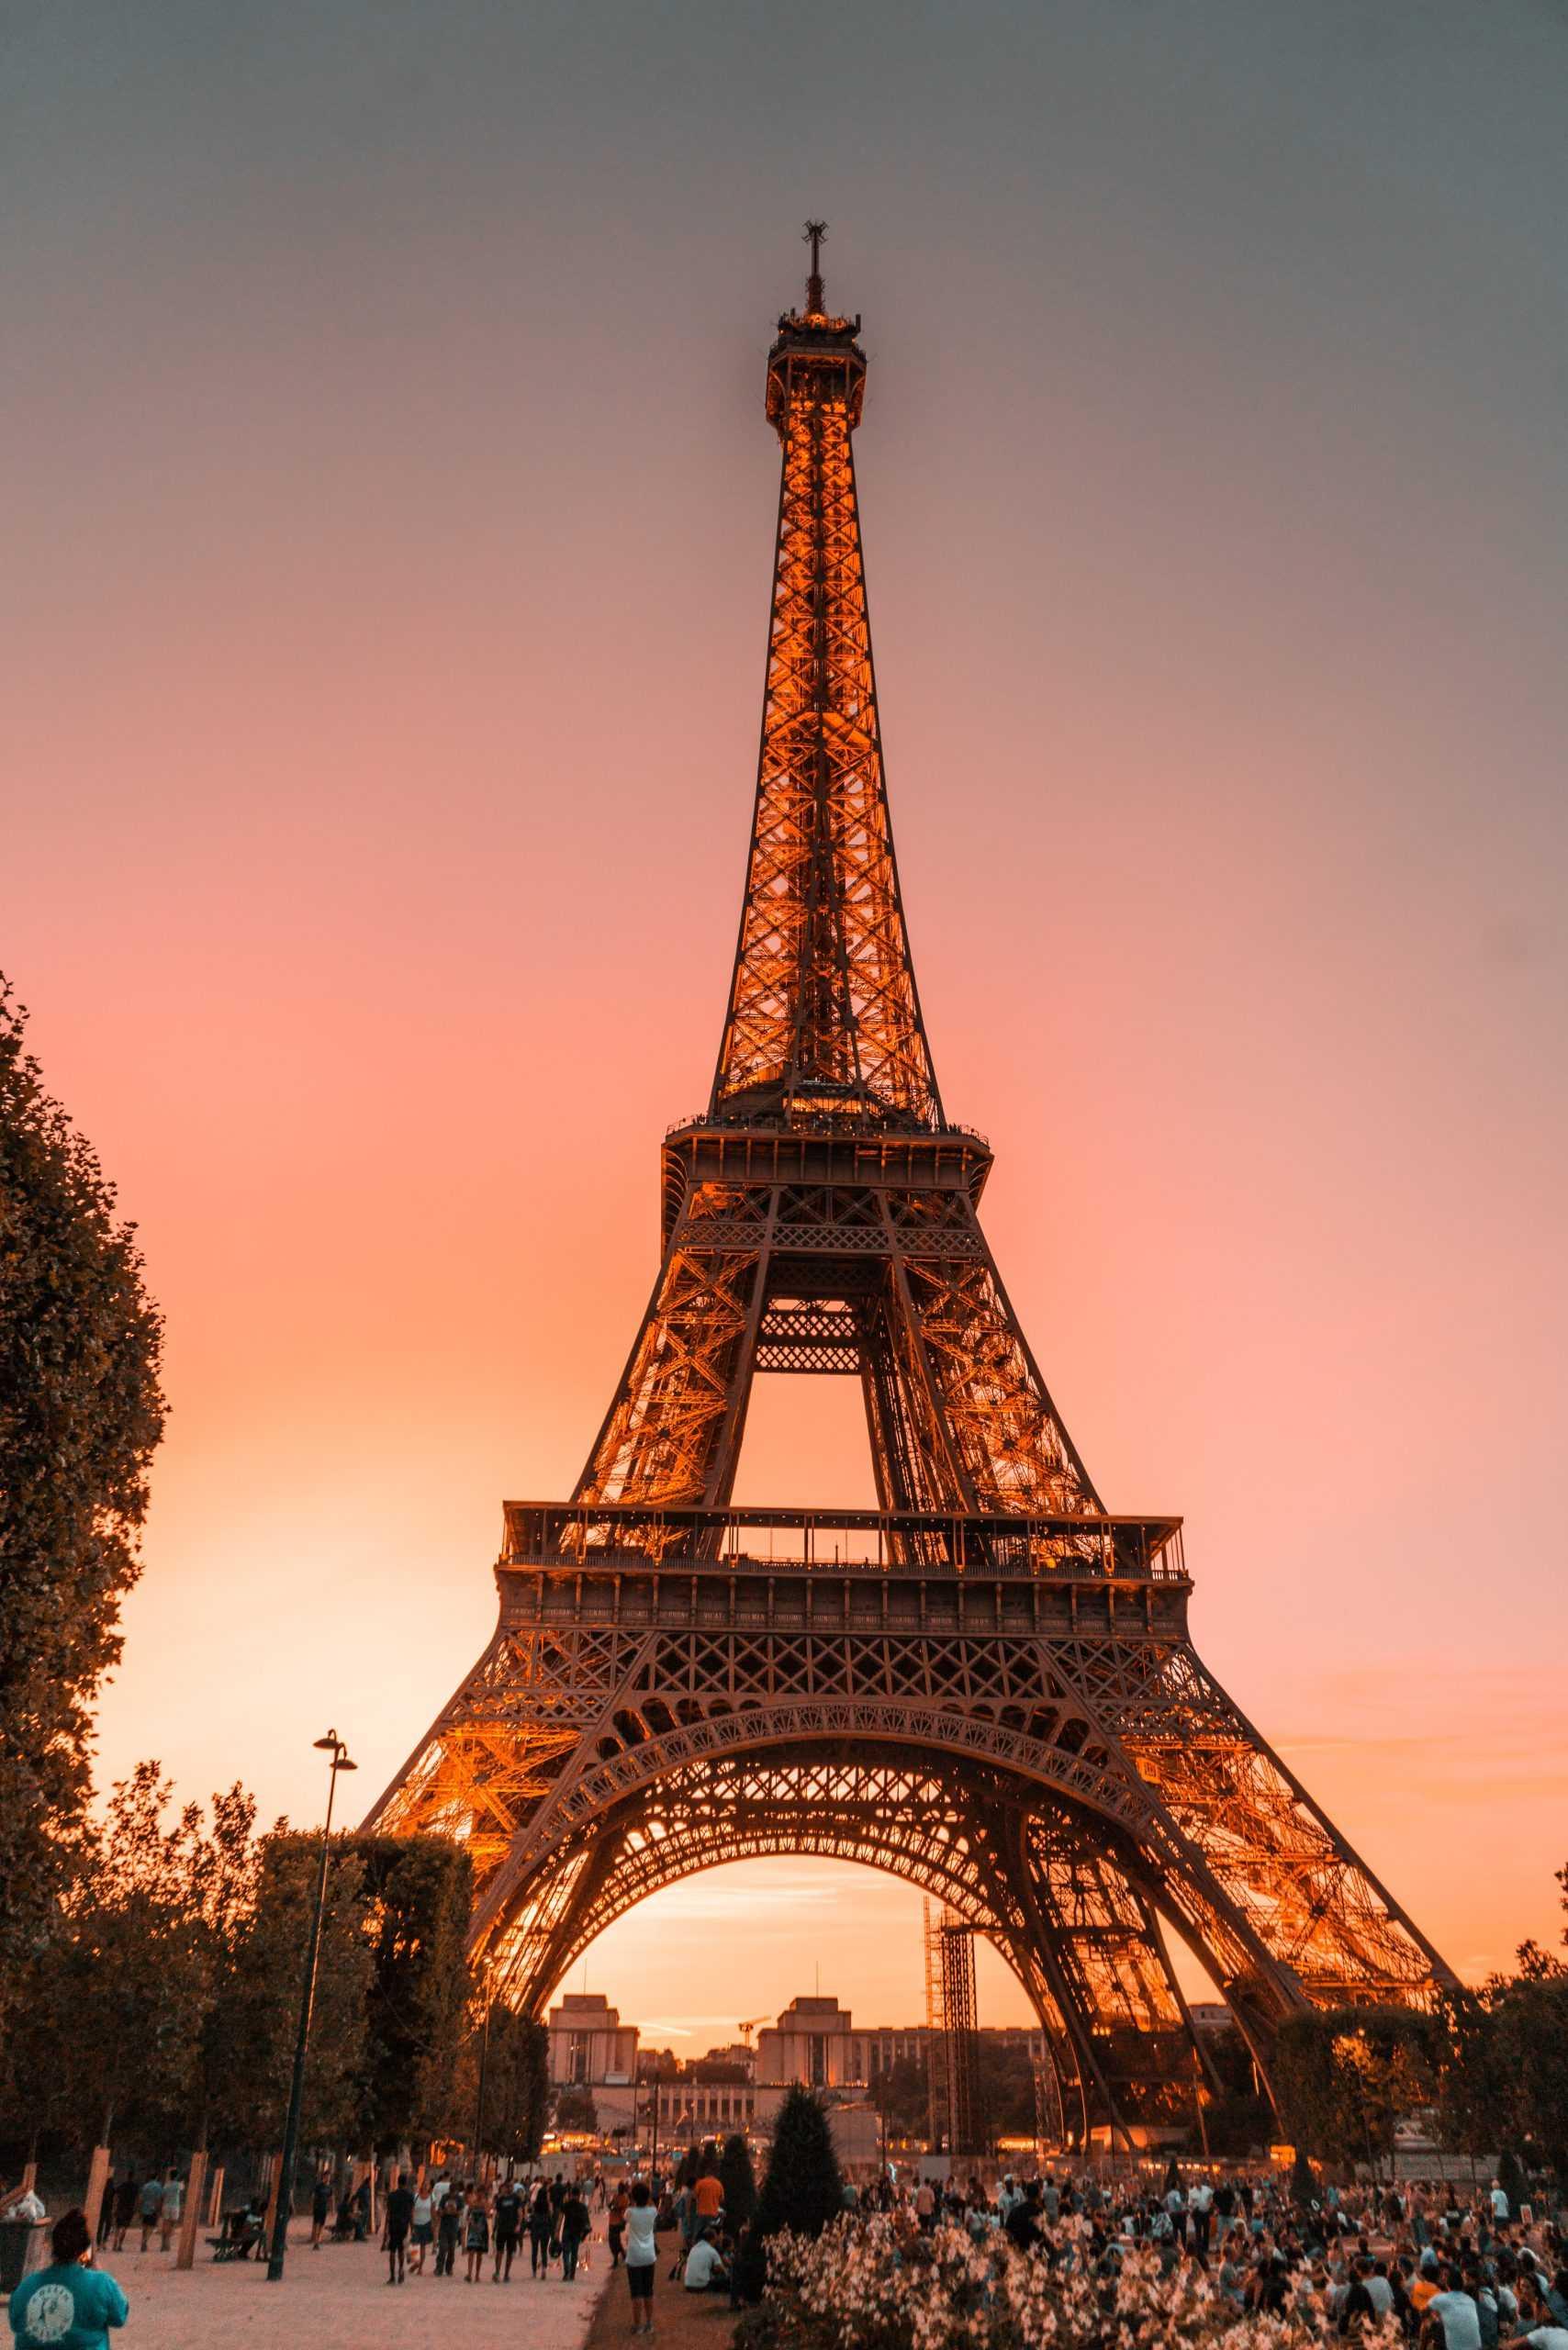 famous landmarks in the world